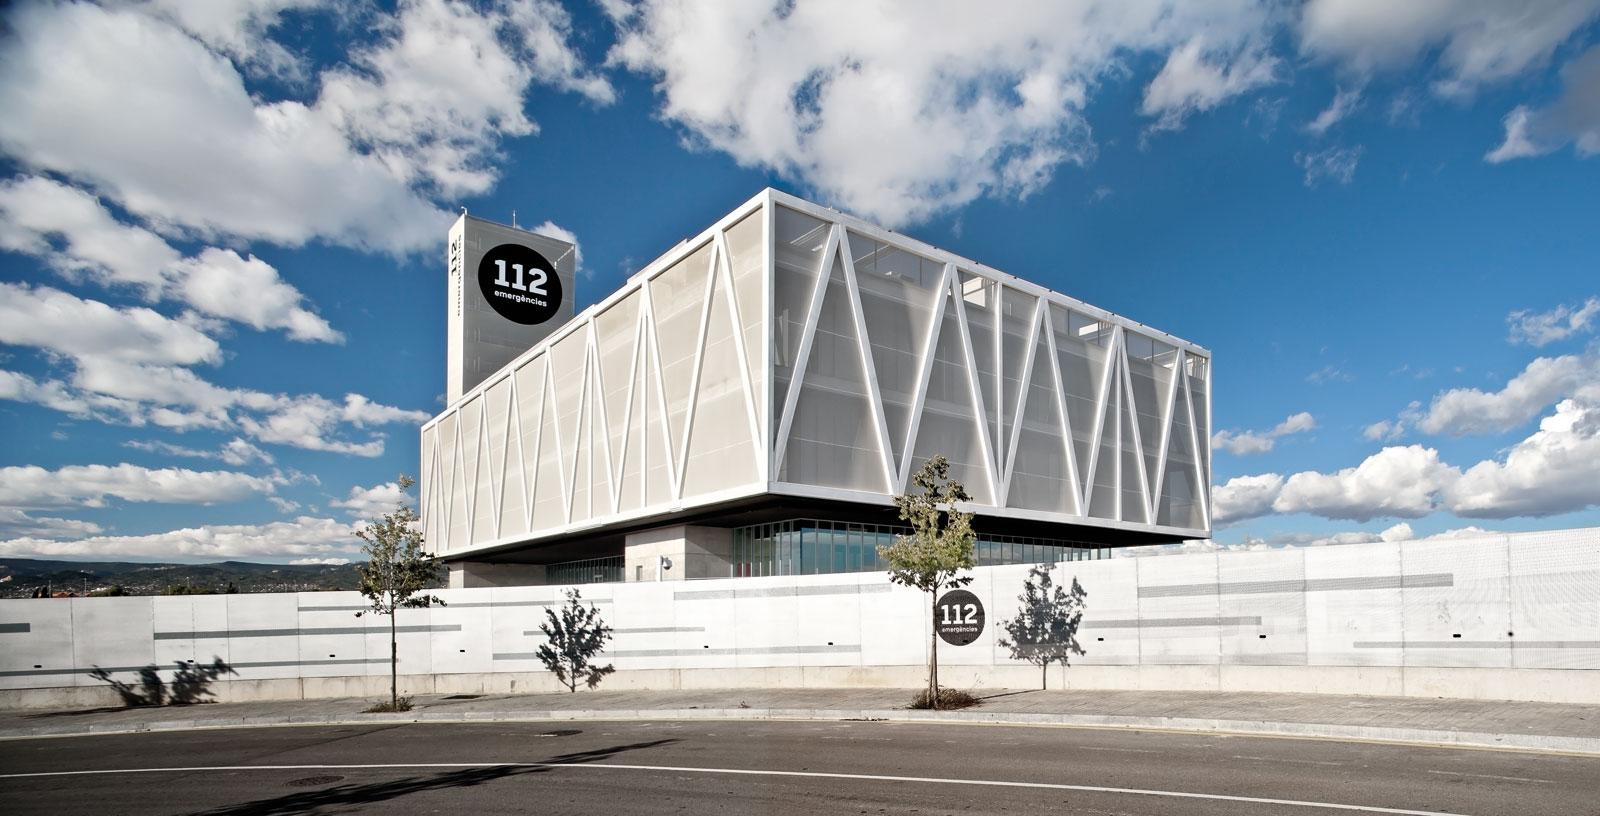 112-emergencies-building_01_Architecture_Idom_Photos_Adria_Goula